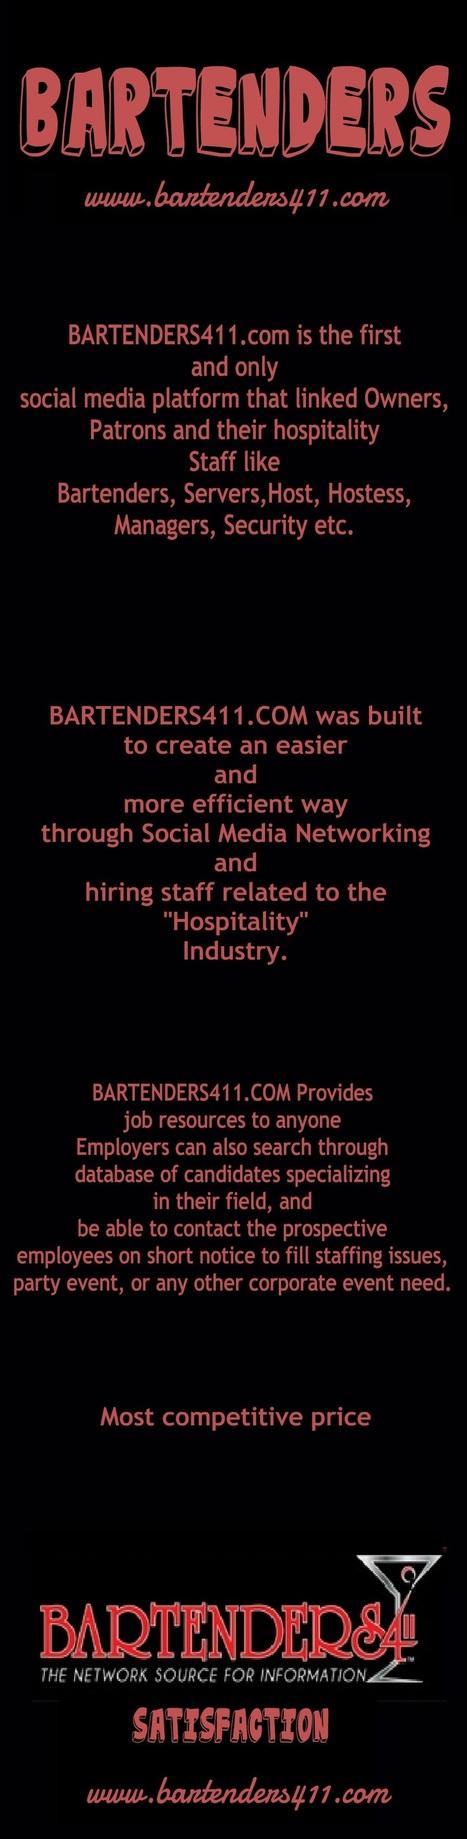 All about Bartenders | Bartenders on GOOD | Bar Tender | Scoop.it